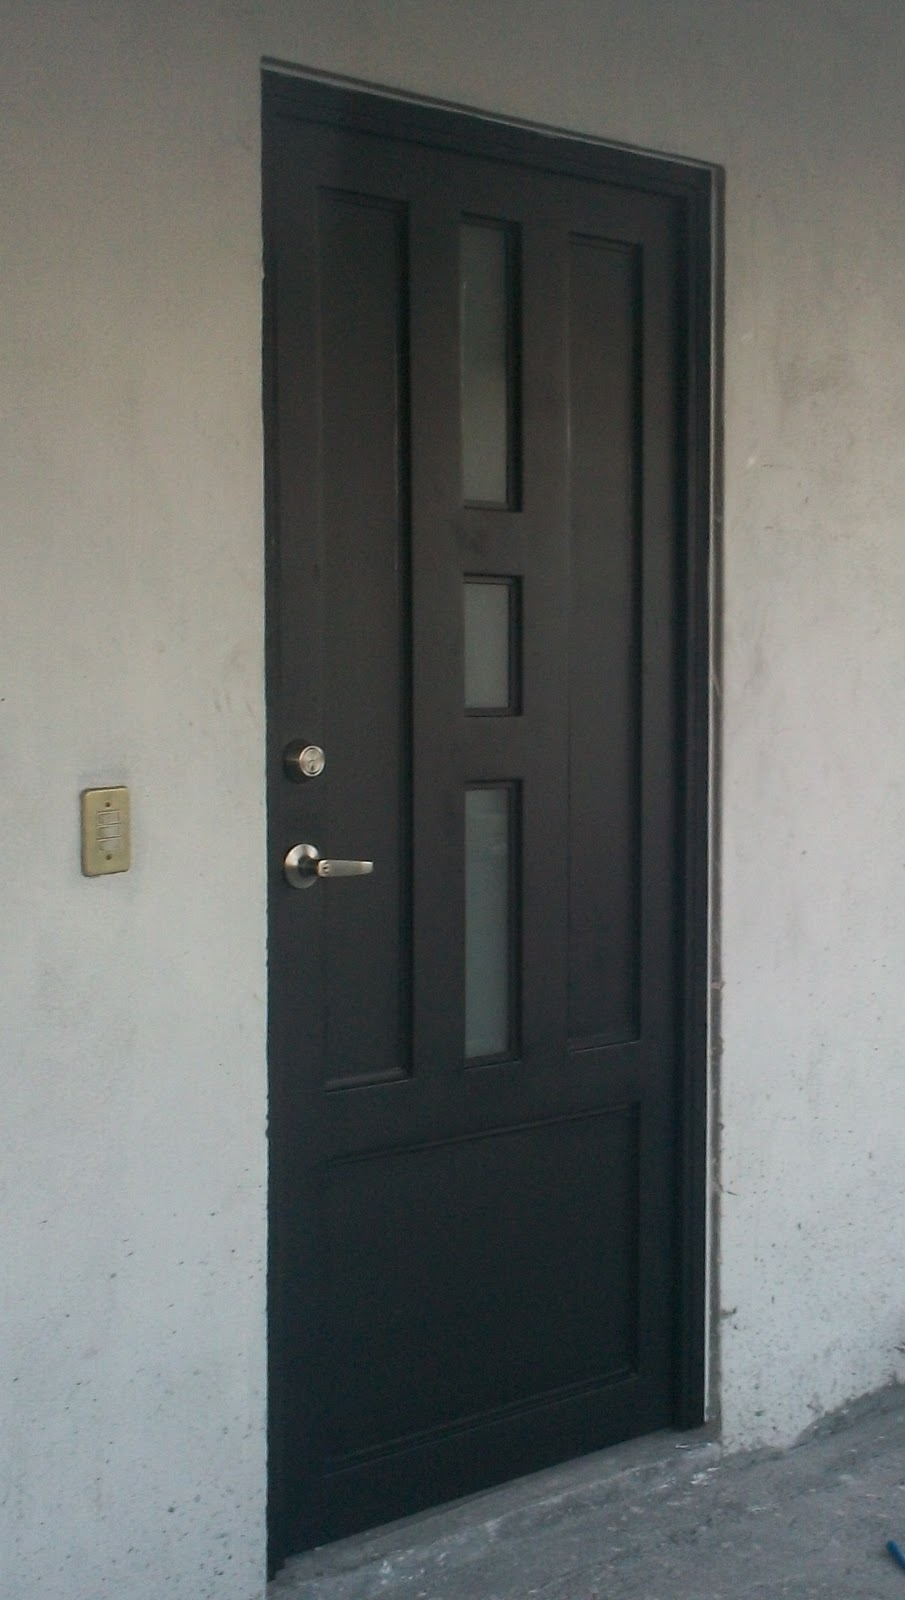 Fotos puertas principales com portal pelautscom picture for Puertas de herreria forjada